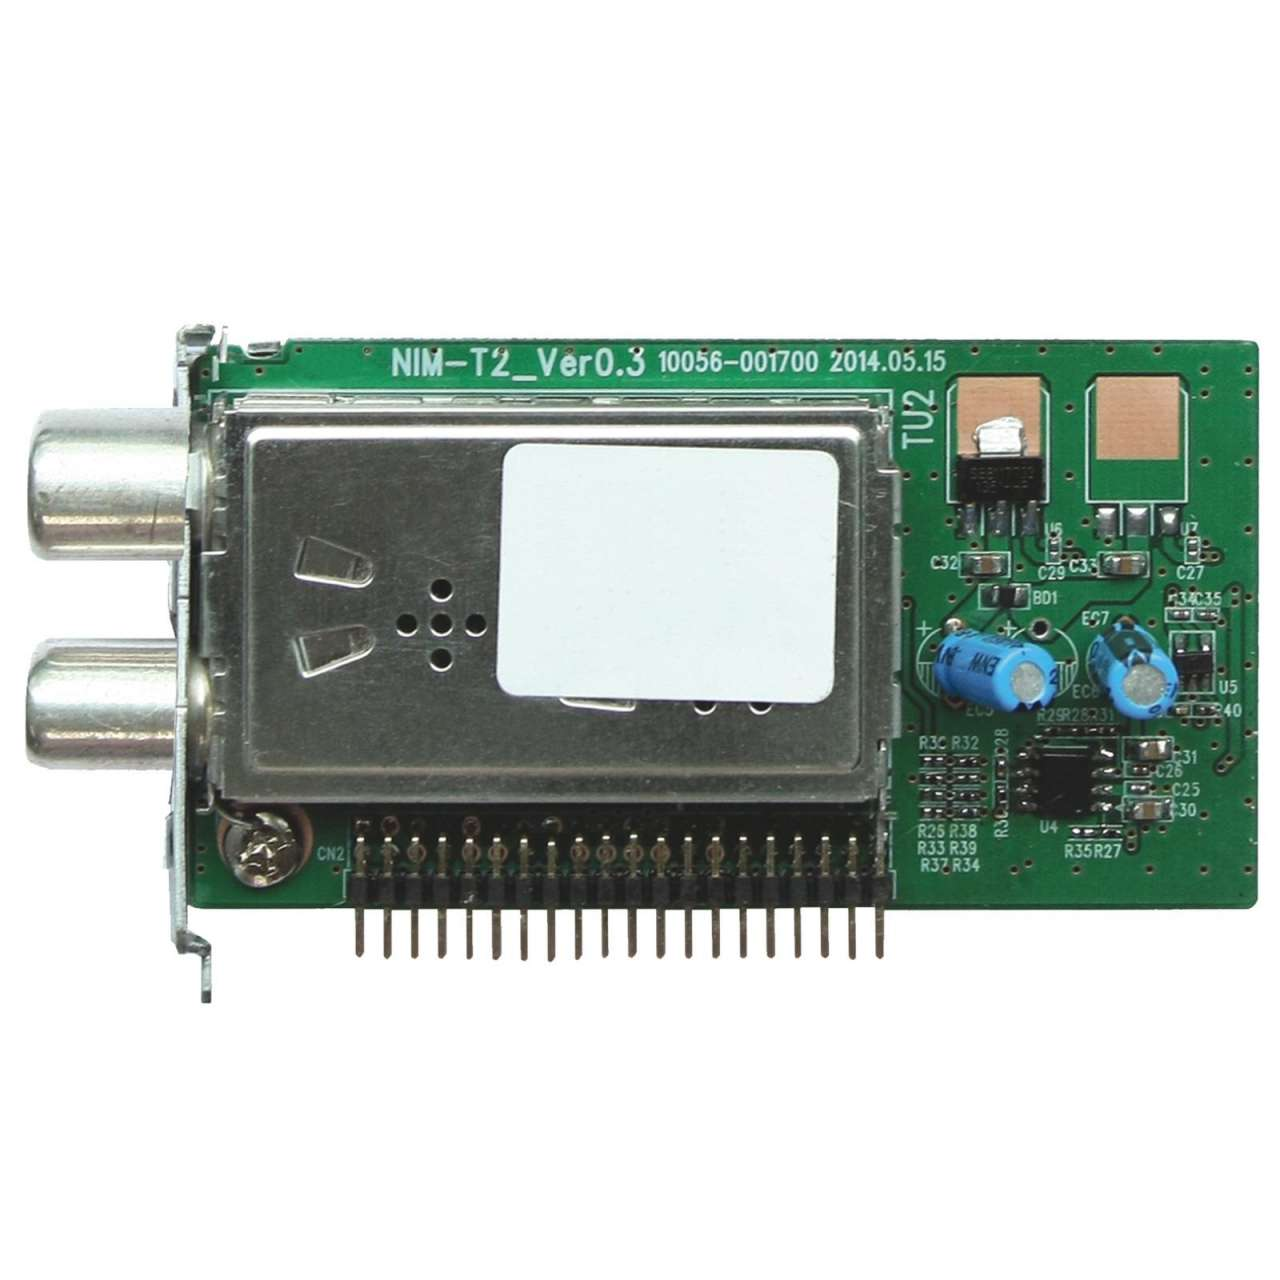 Formuler F1 Plug & Play DVB-C/T2 Hybrid HDTV Tuner FORZUB002